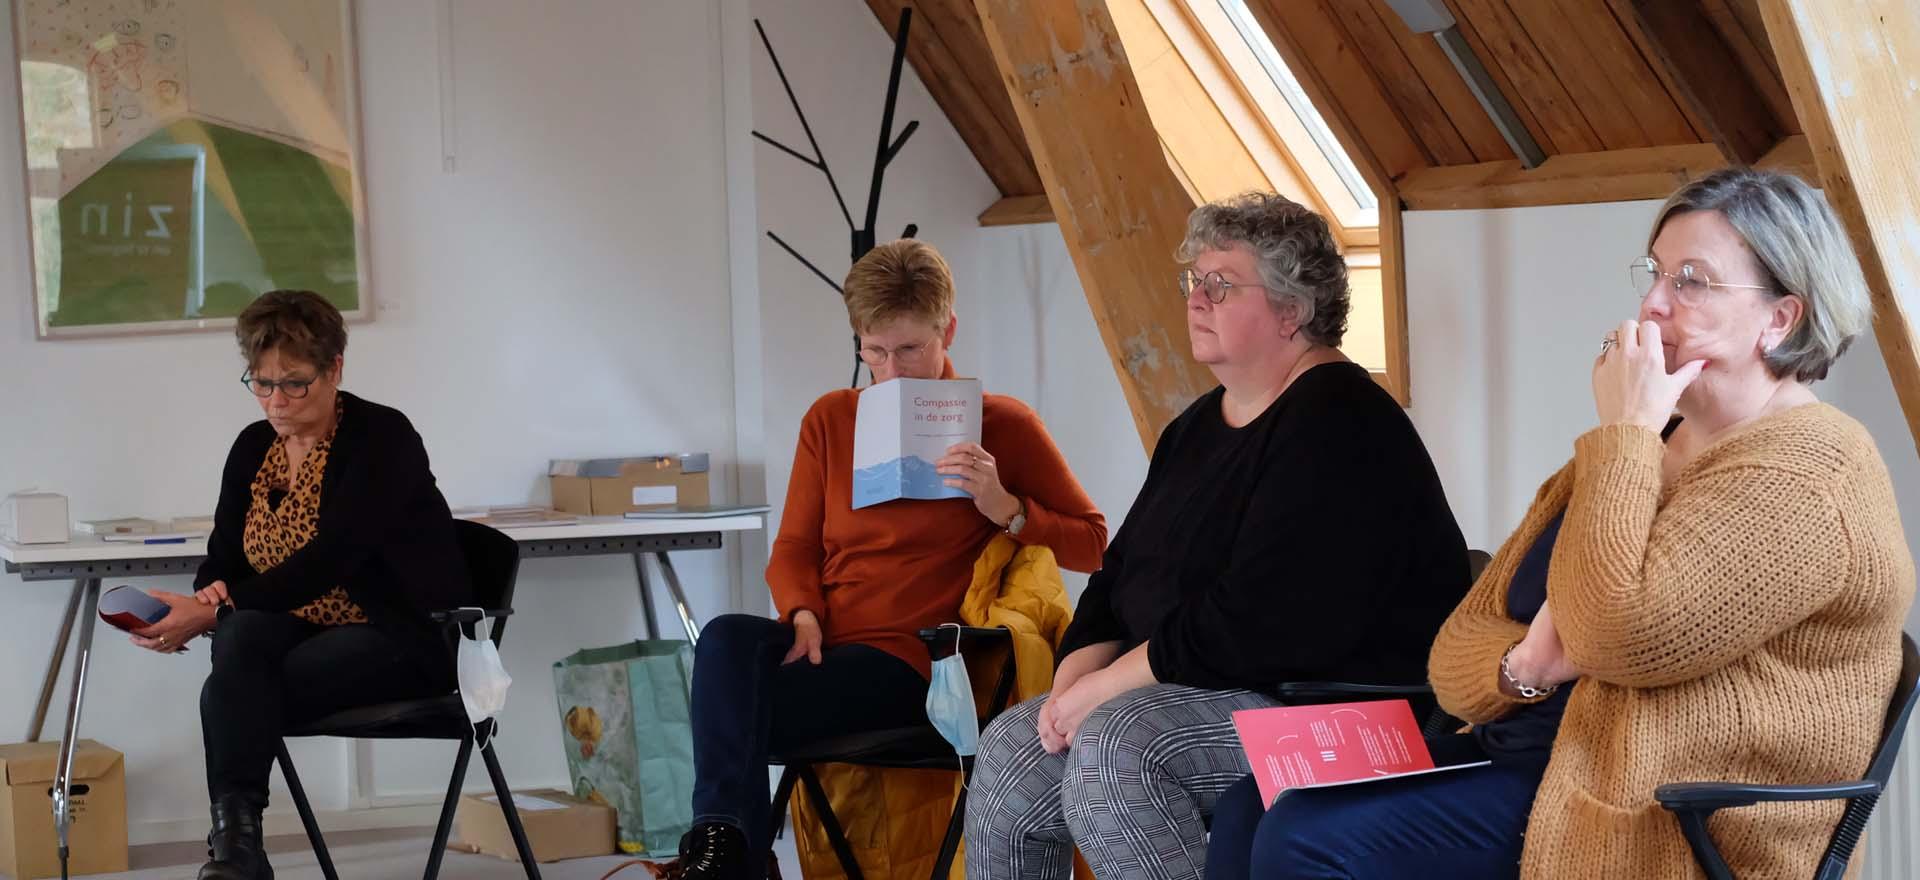 Compassie in de Zorg training workshop